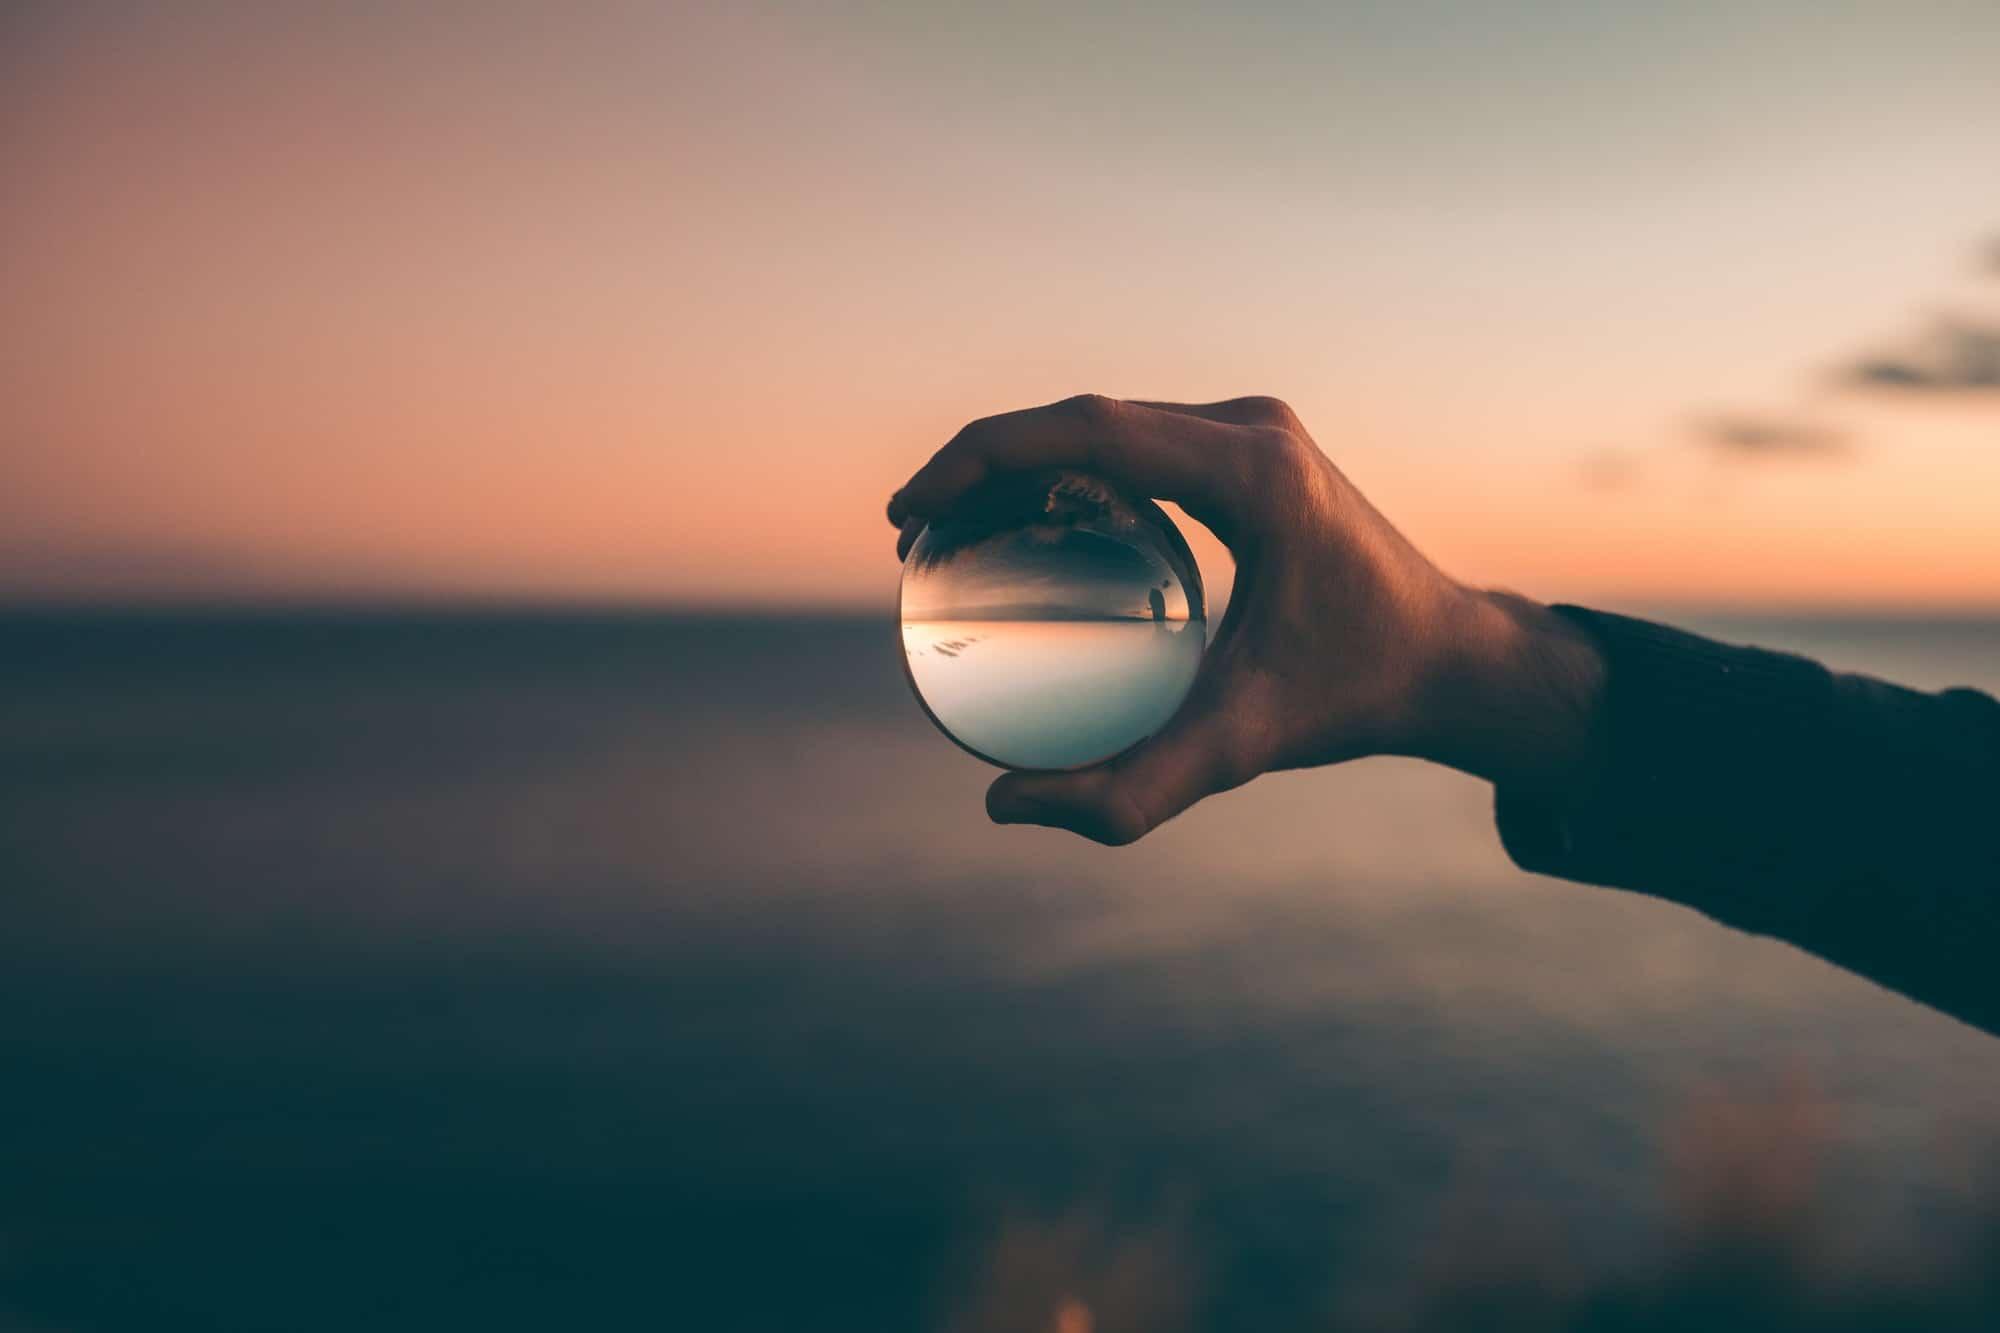 The psychology of the mind concept - positive mindset